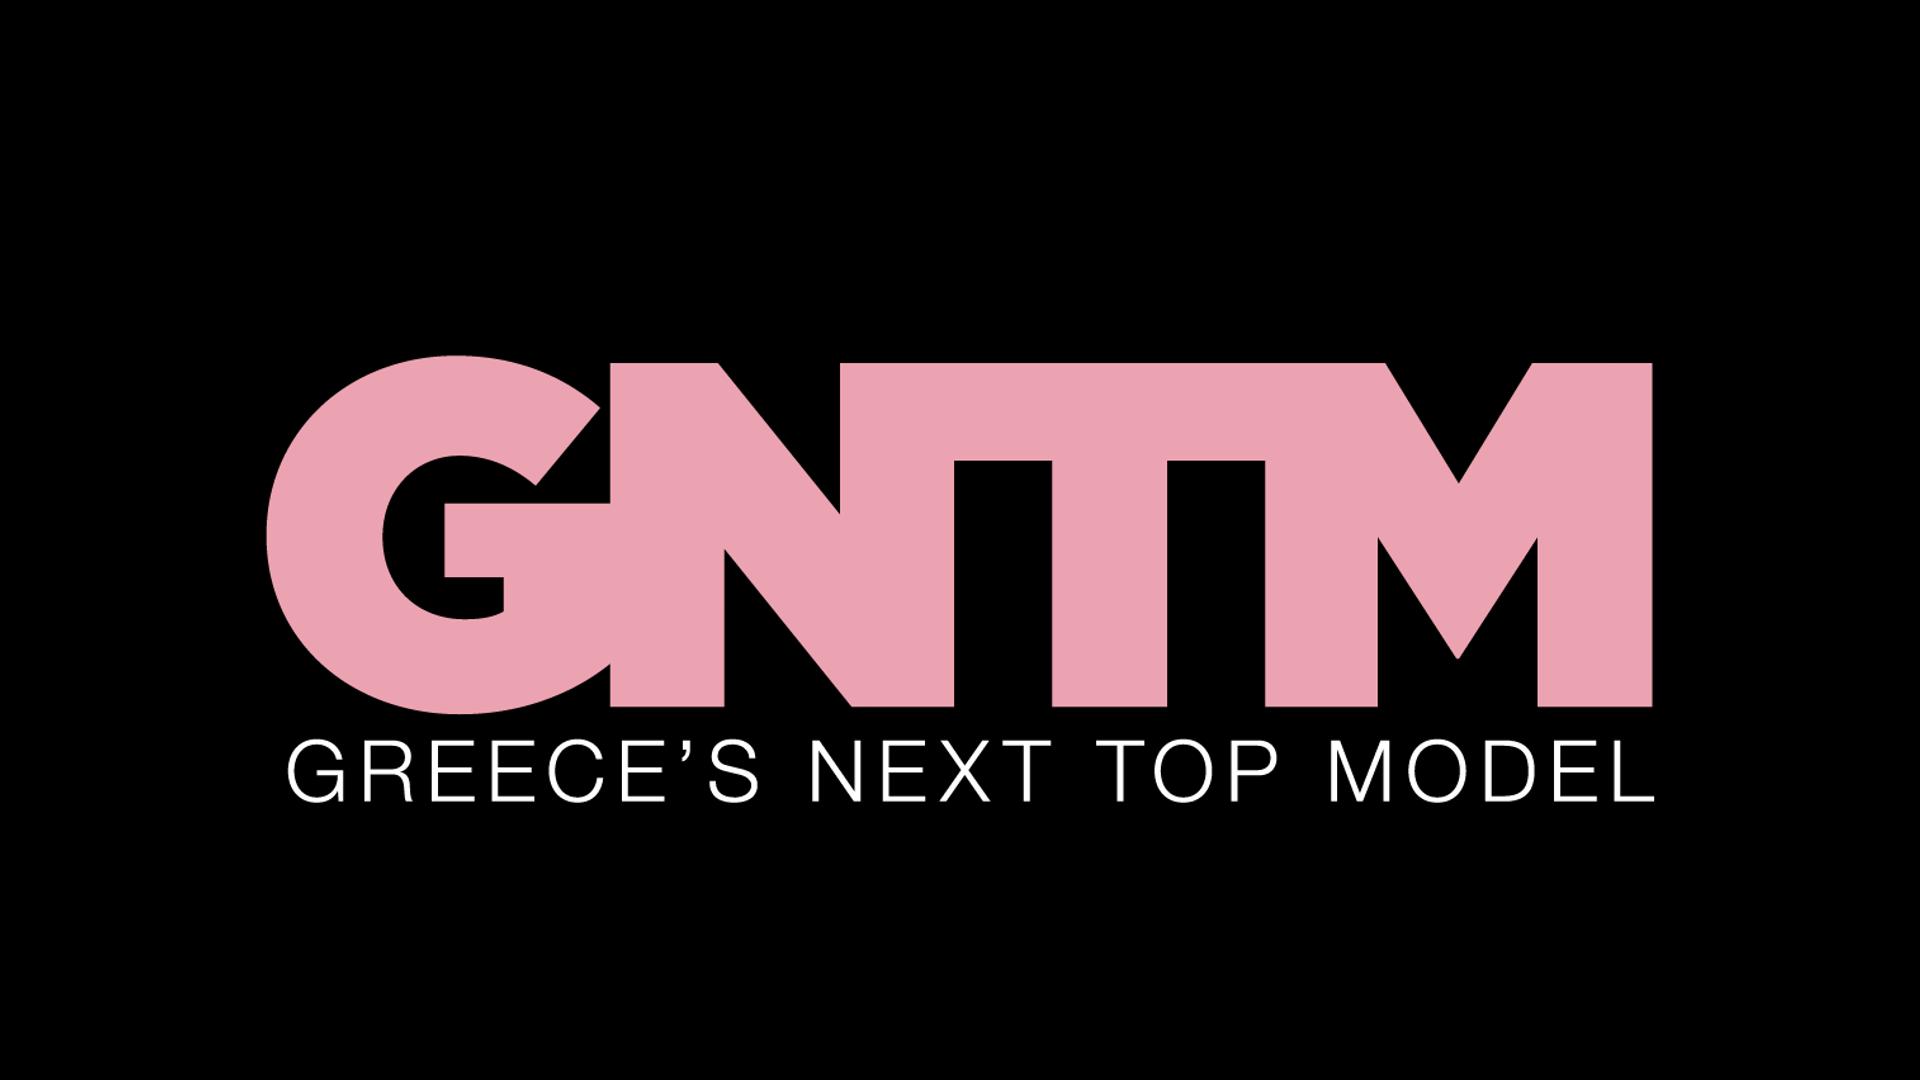 Tο logo του GNTM (Greece's Next Top Model) - Sputnik Ελλάδα, 1920, 13.09.2021